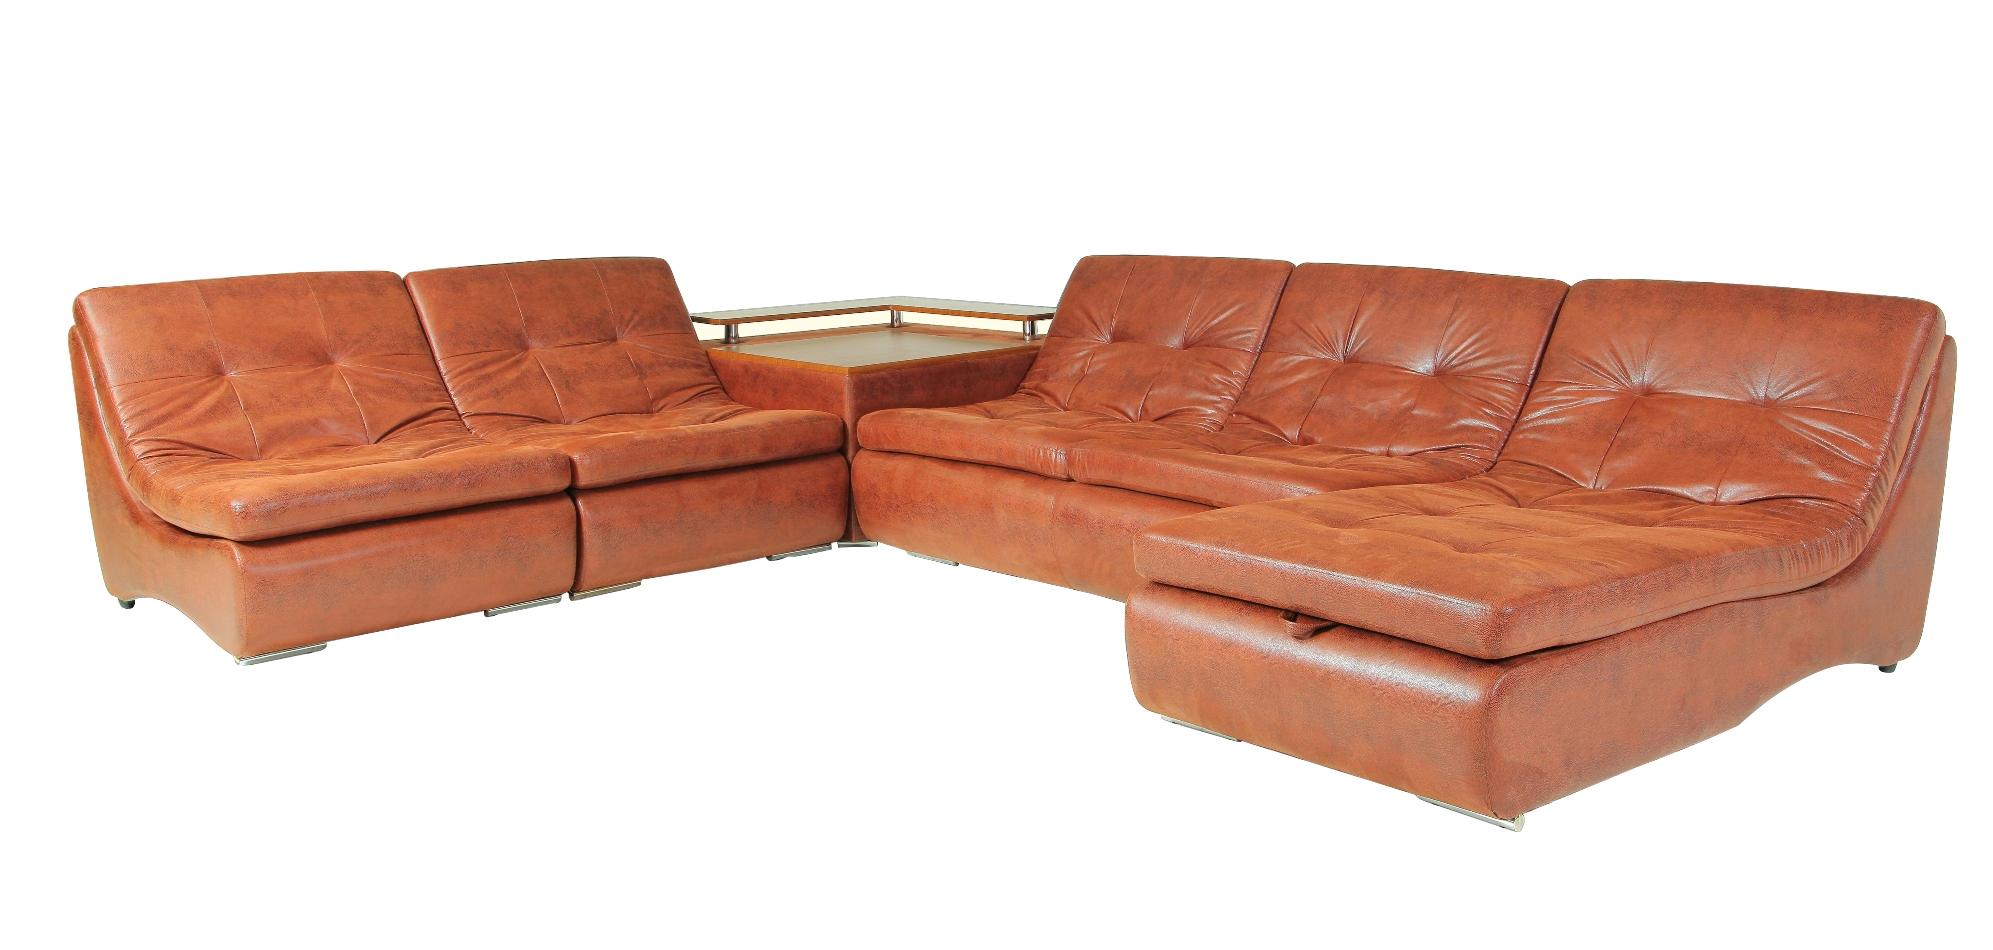 Угловой модульный диван Монреаль-5 модульный угловой шкаф виго